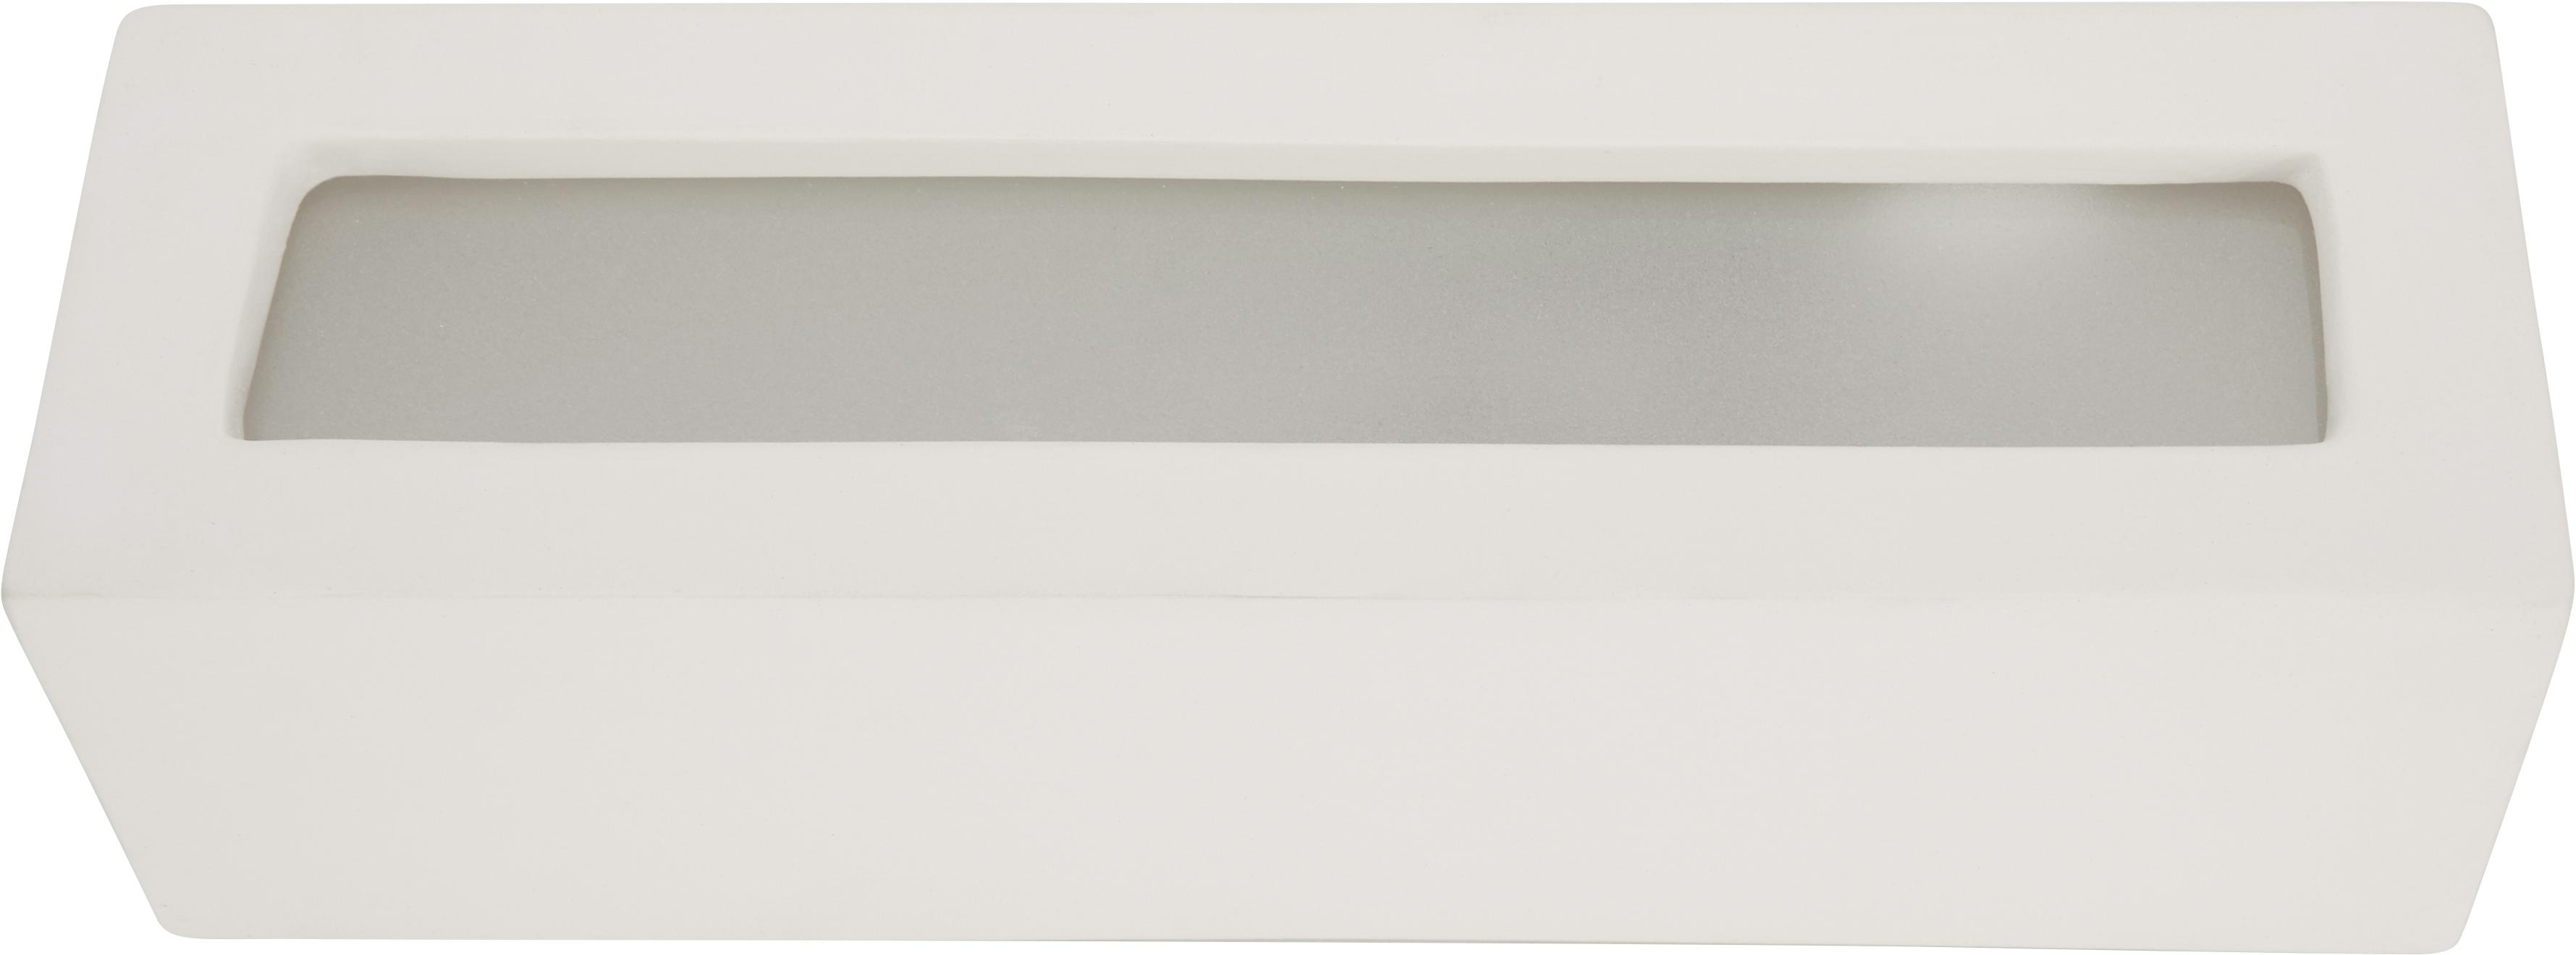 Applique céramique Madrid, Blanc